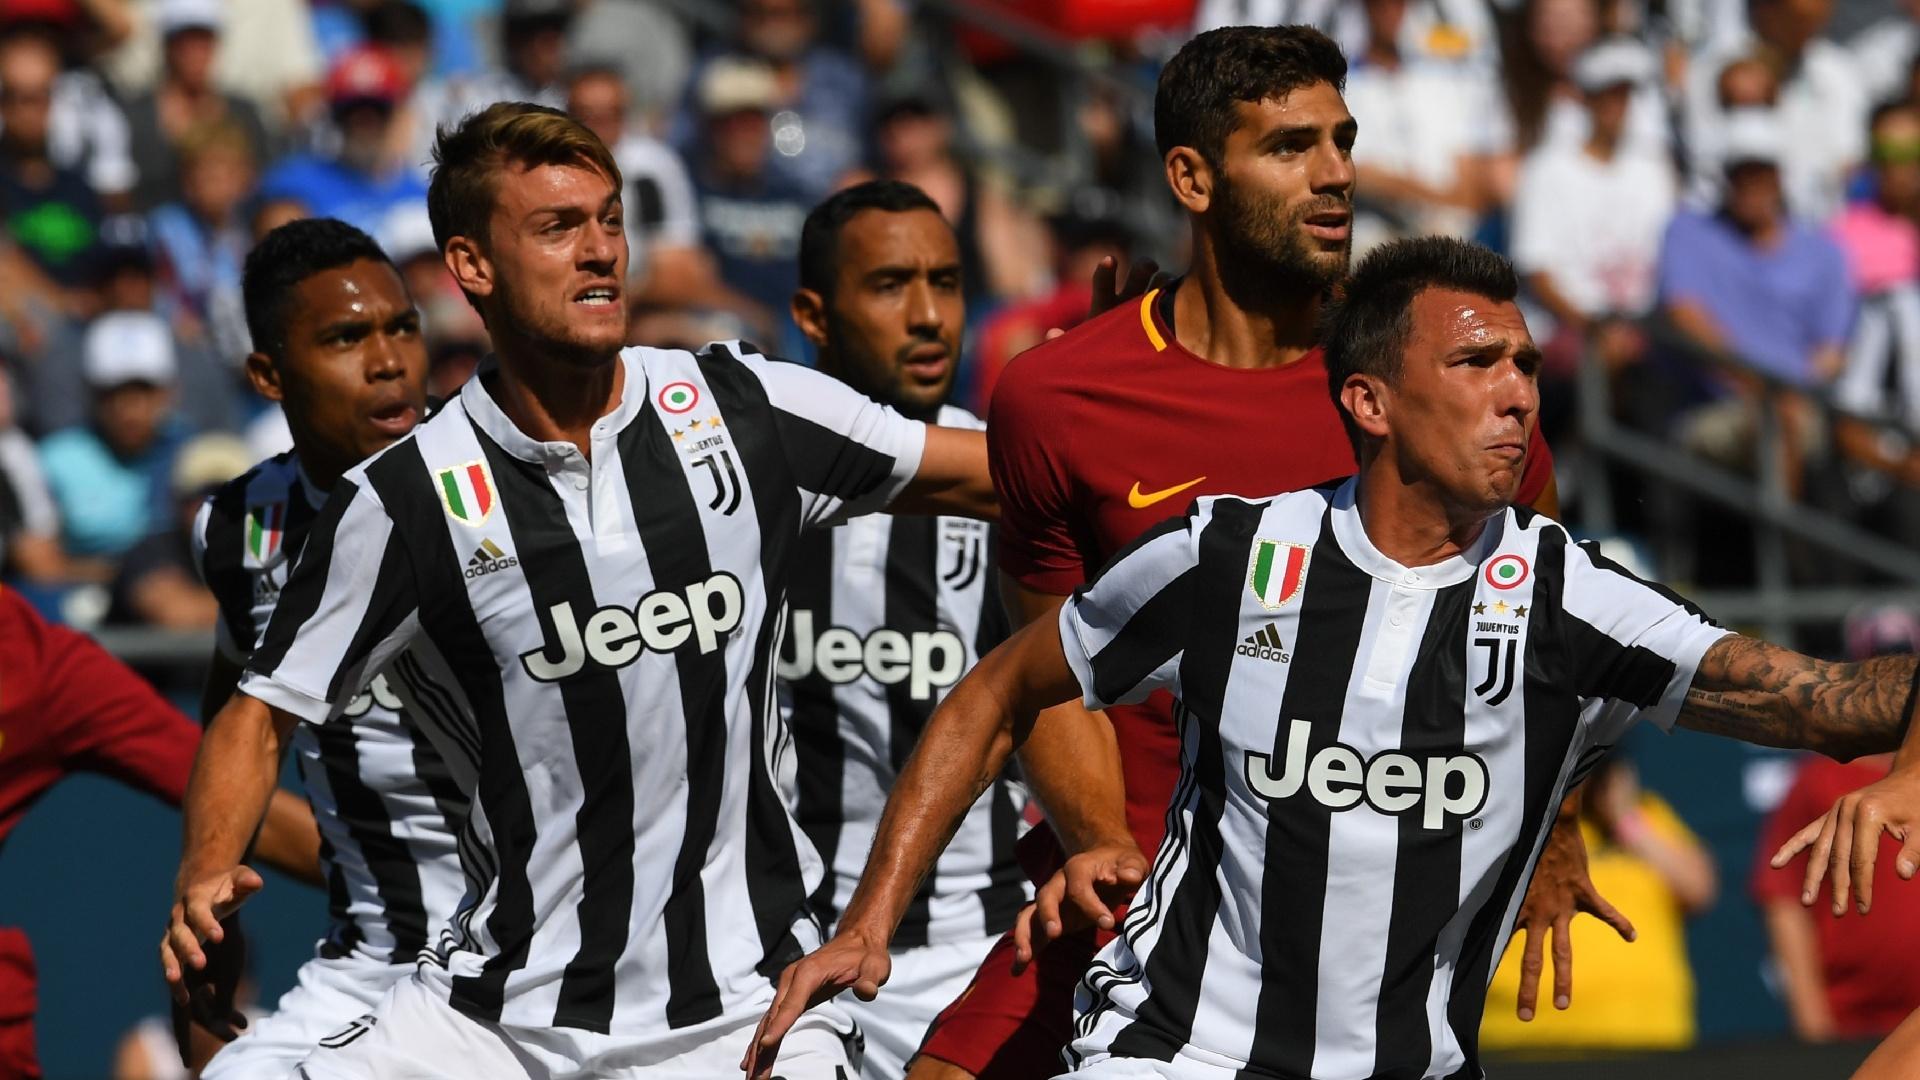 Jogadores de Roma e Juventus observam a bola durante partida da International Champions Cup